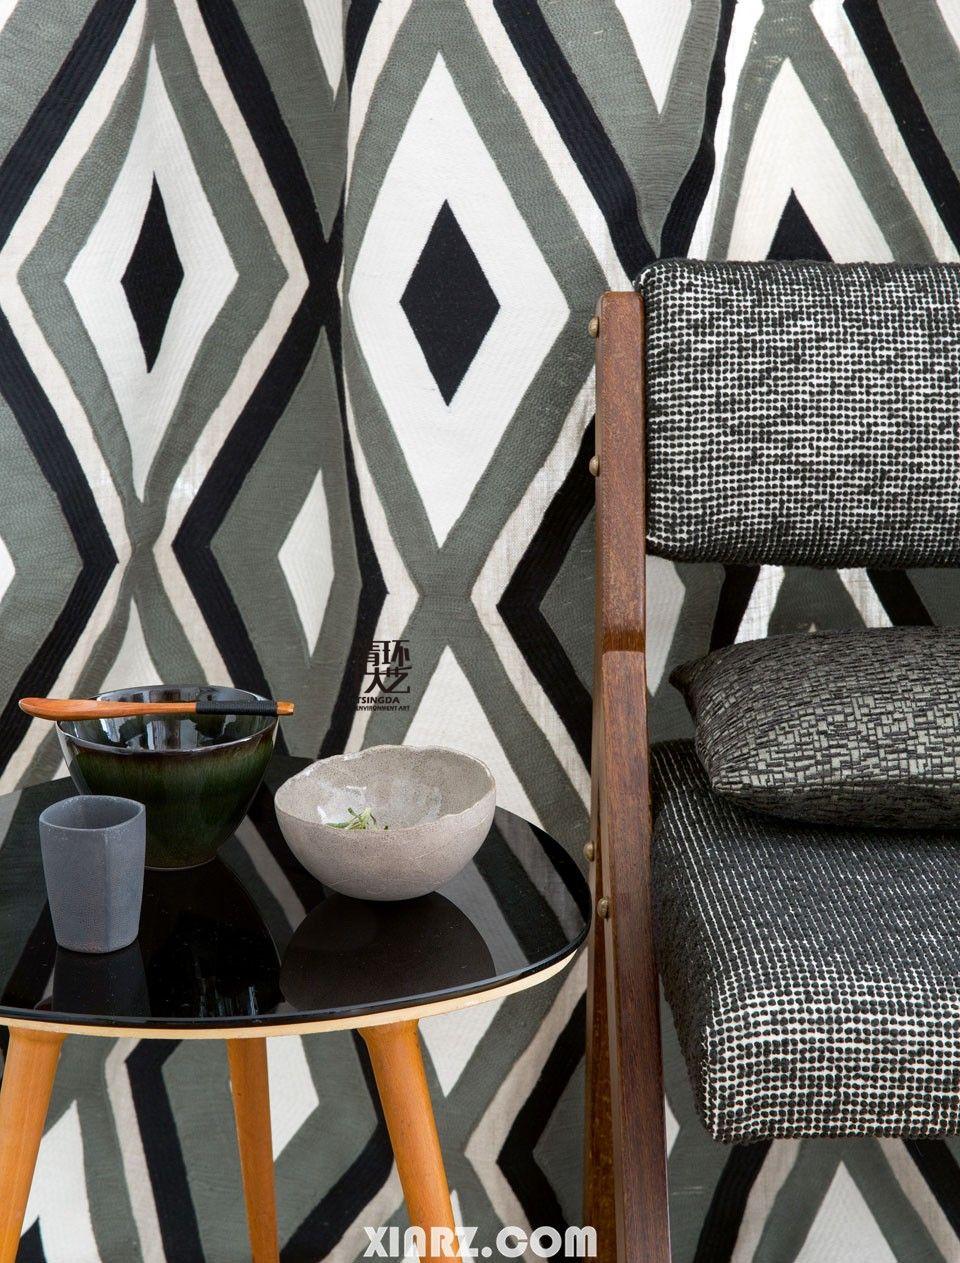 法国纺织品品牌Les tissus